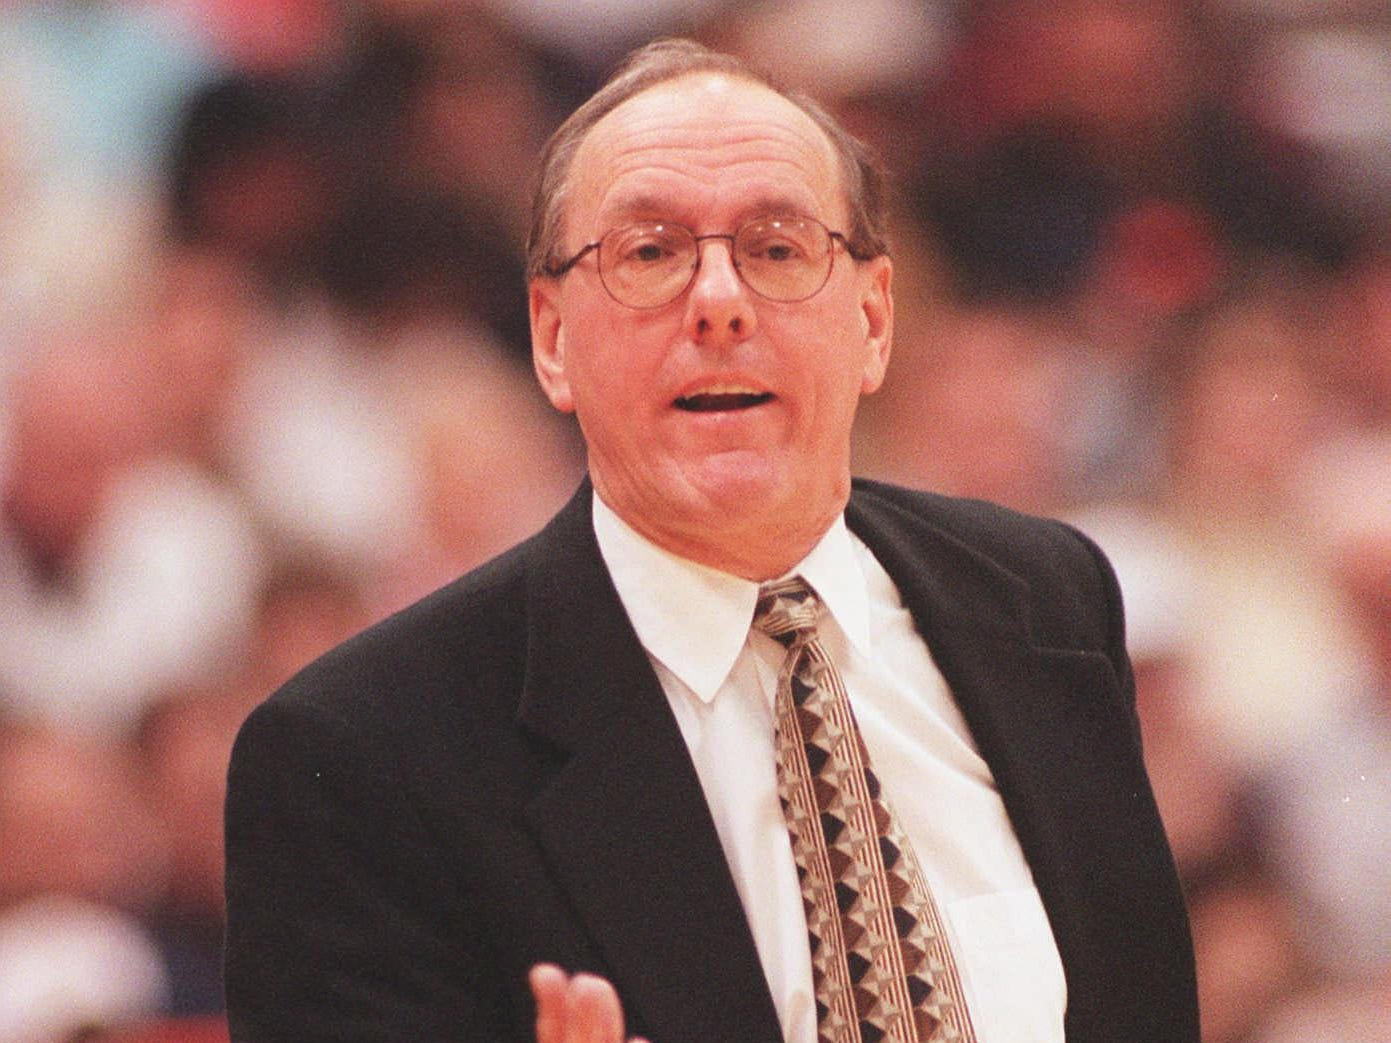 Jim Boeheim coaching Syracuse to an 81-68 win over Alabama on Feb. 4, 1996.